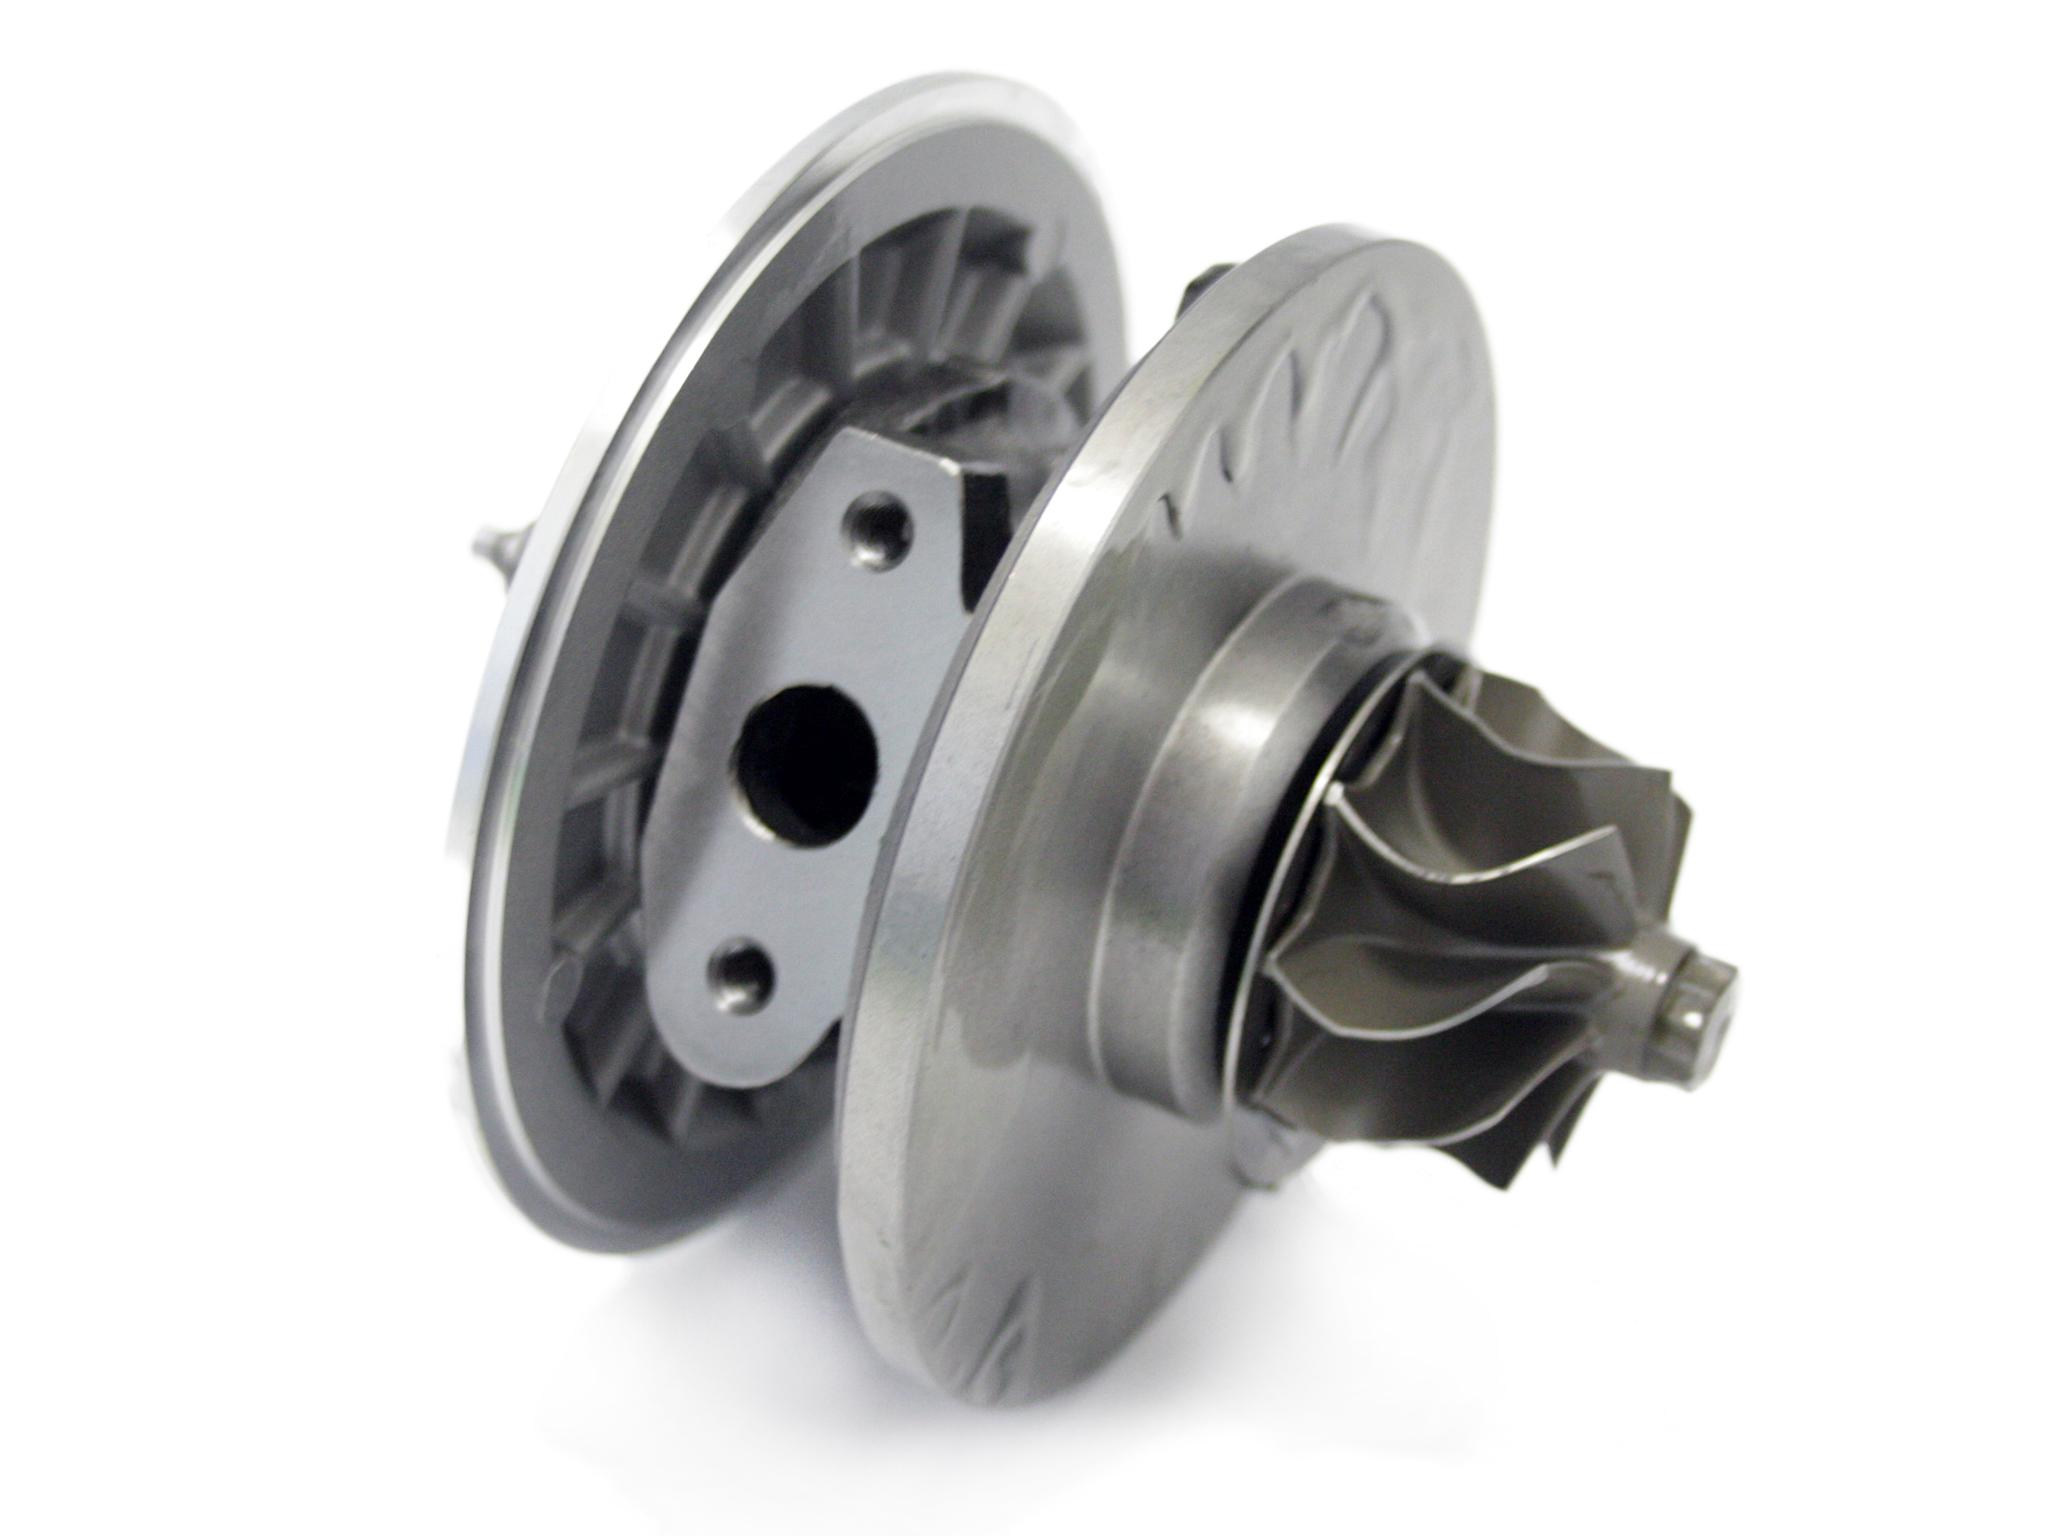 Картридж турбины GT1749MV Сааб 9-3 1.9 TID 120 л.с.